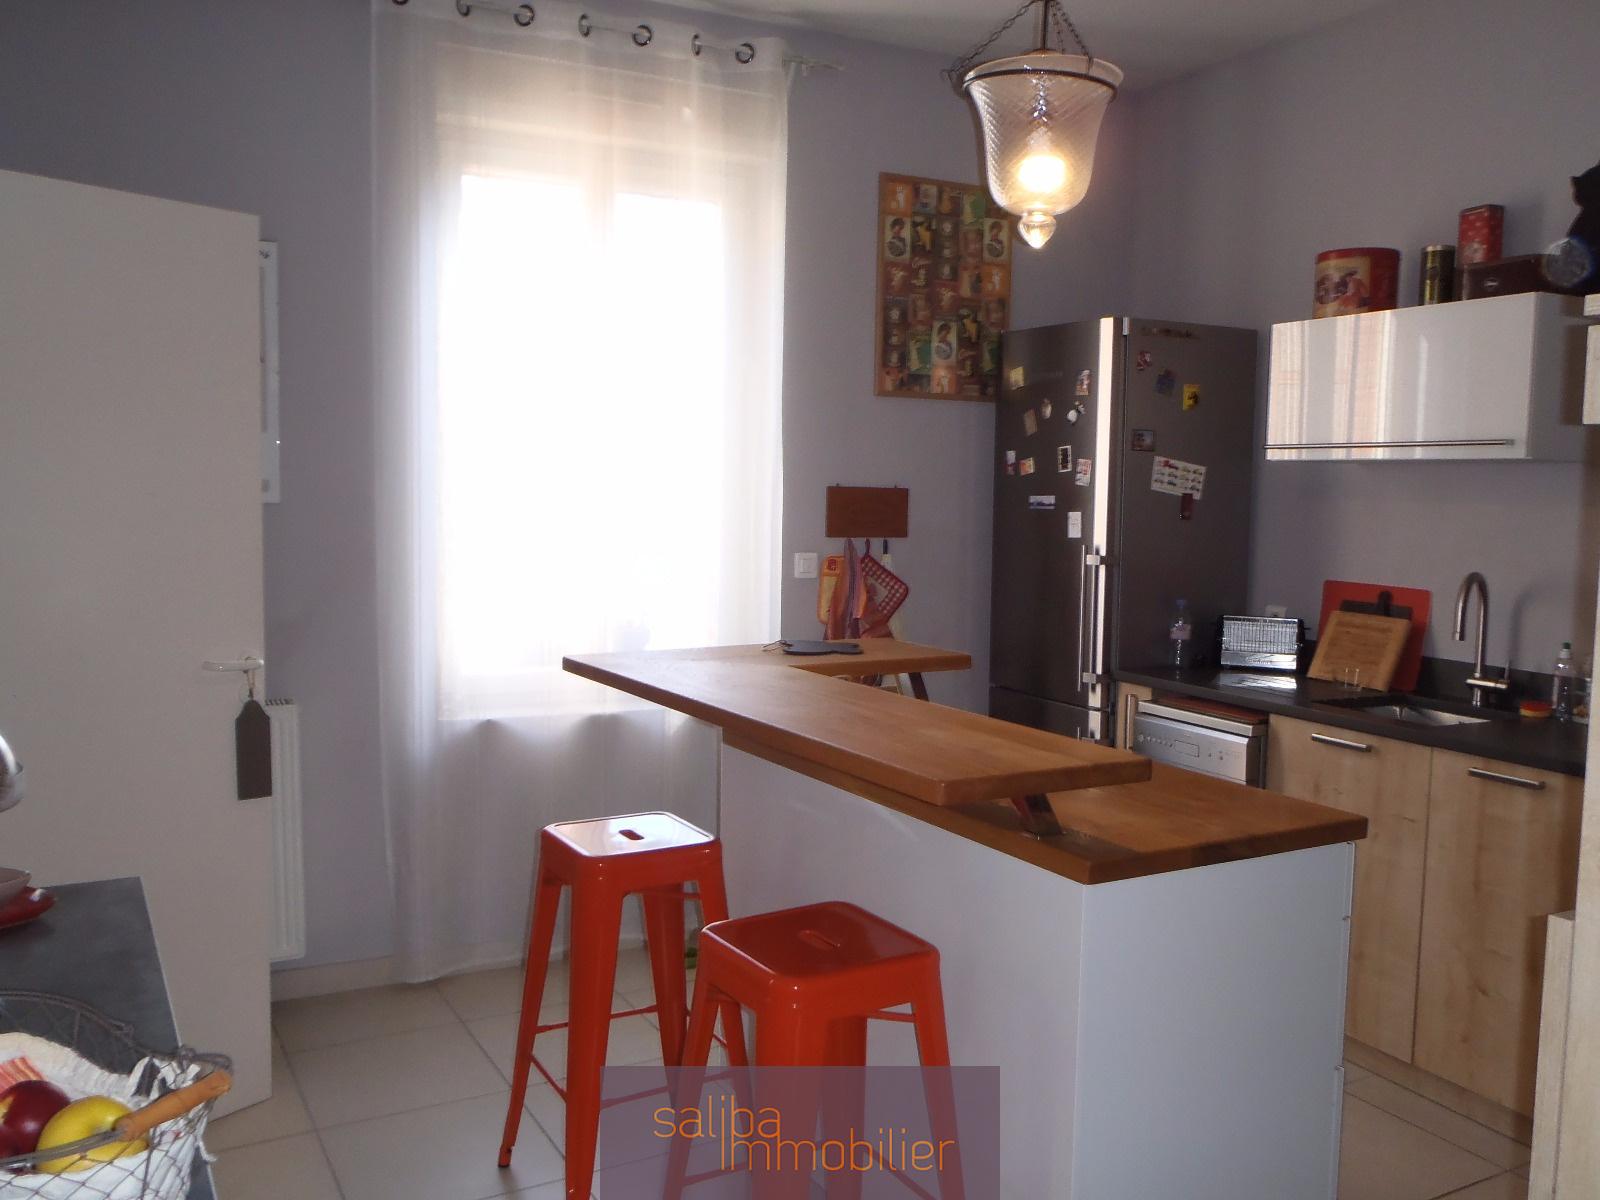 maison albi albi maison with maison albi best vente maison albi with maison albi great vente. Black Bedroom Furniture Sets. Home Design Ideas